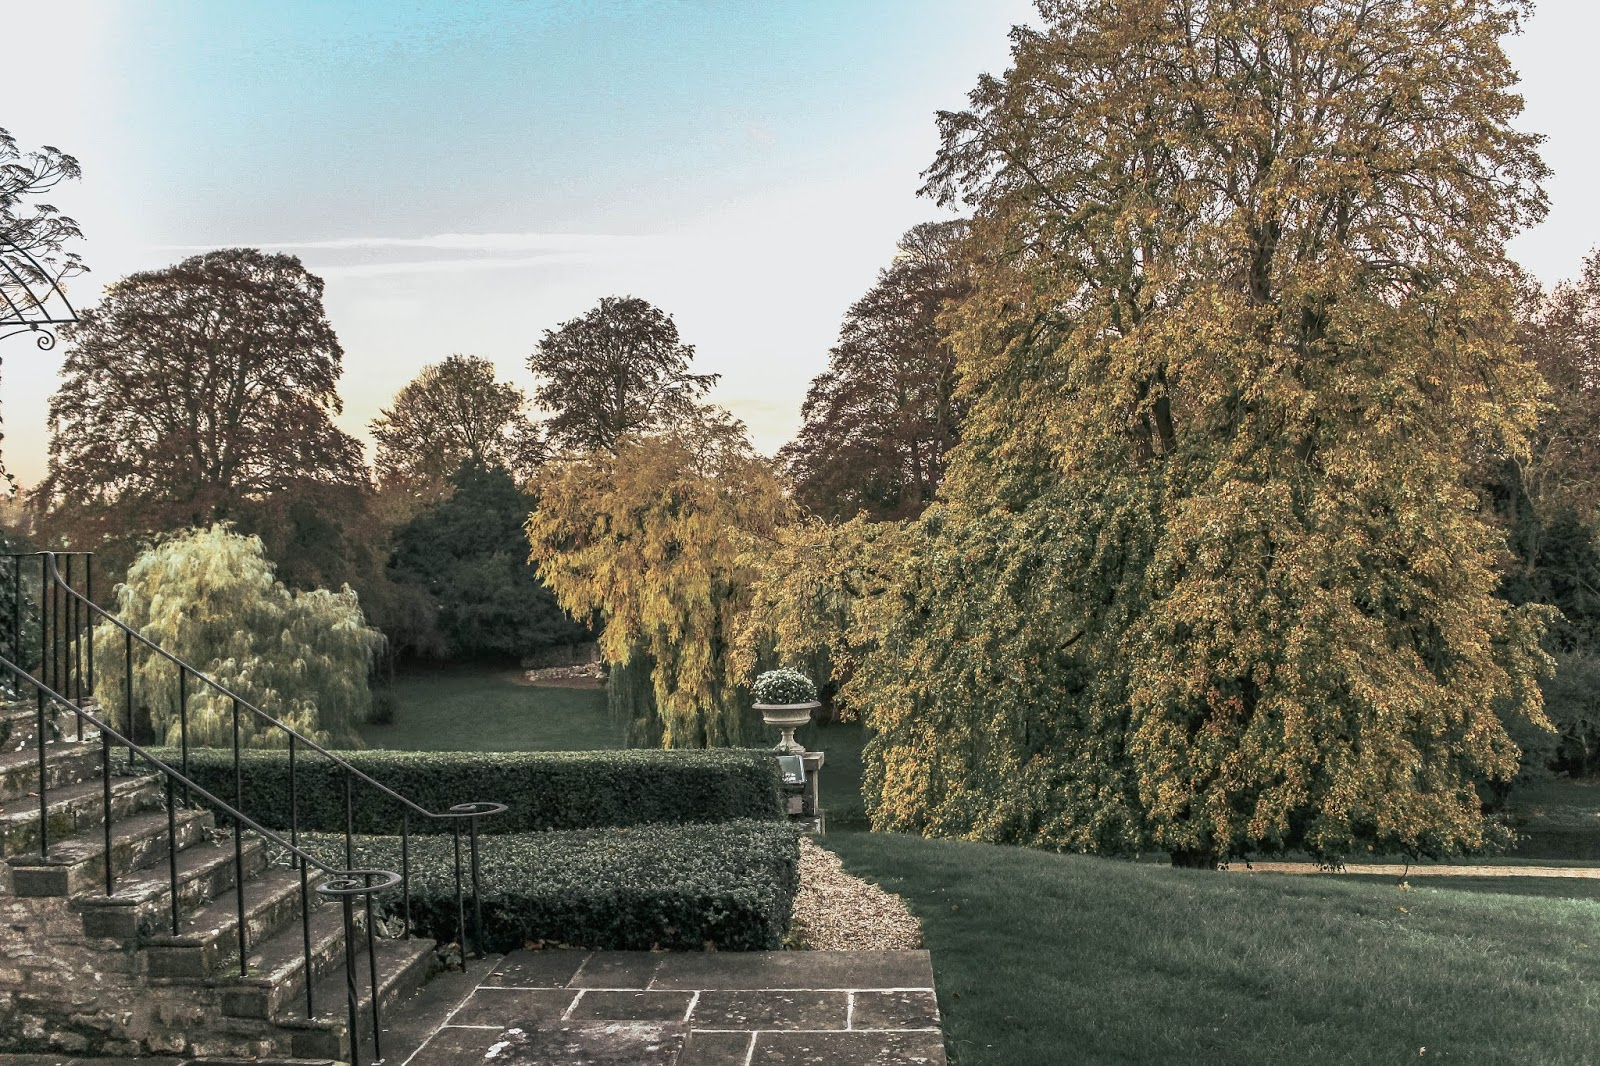 Ston Easton Park Hotel Garden Autumn Photography